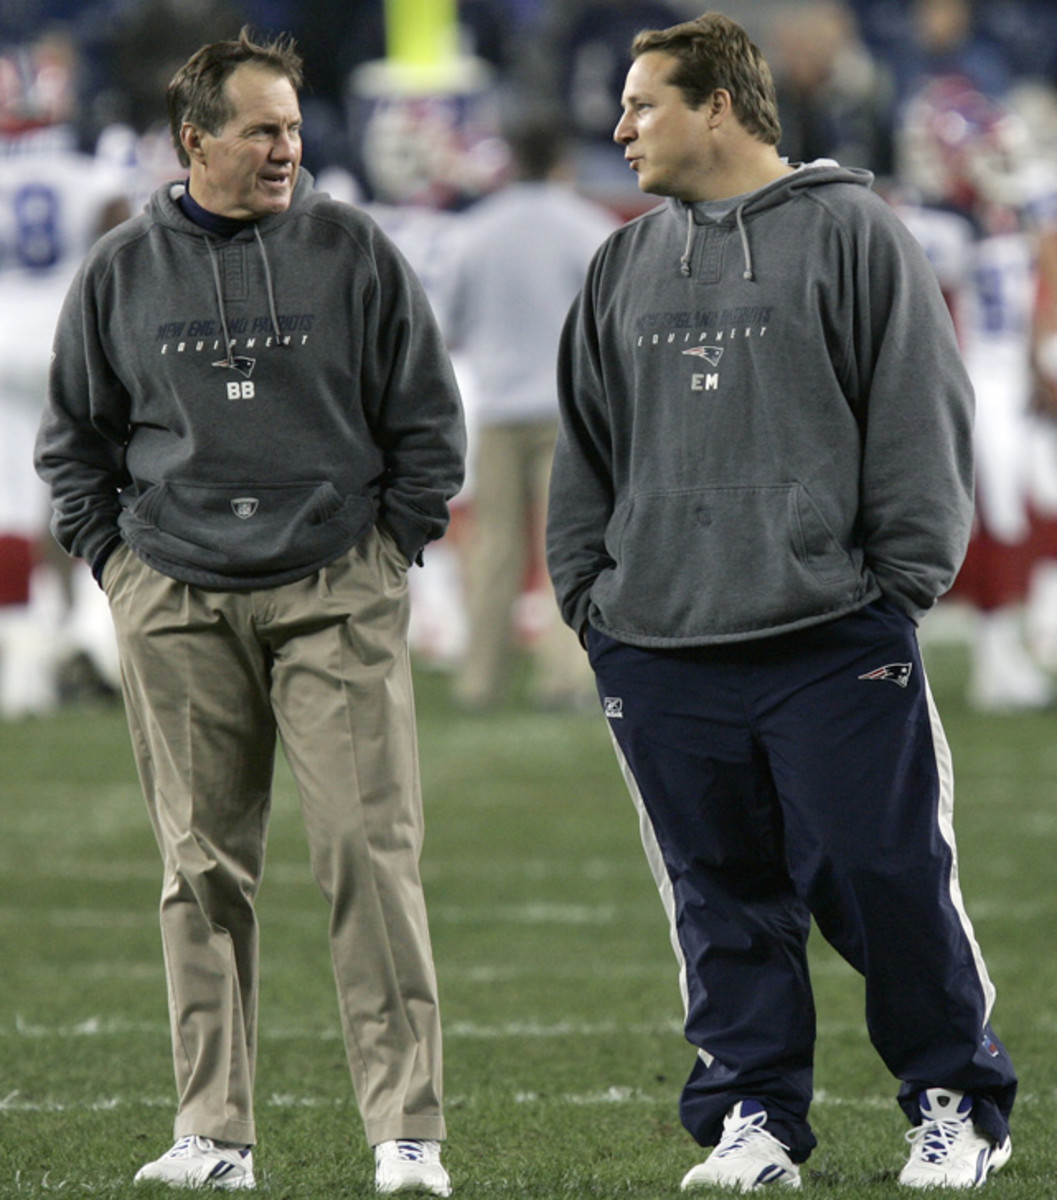 Bill Belichick and Eric Mangini